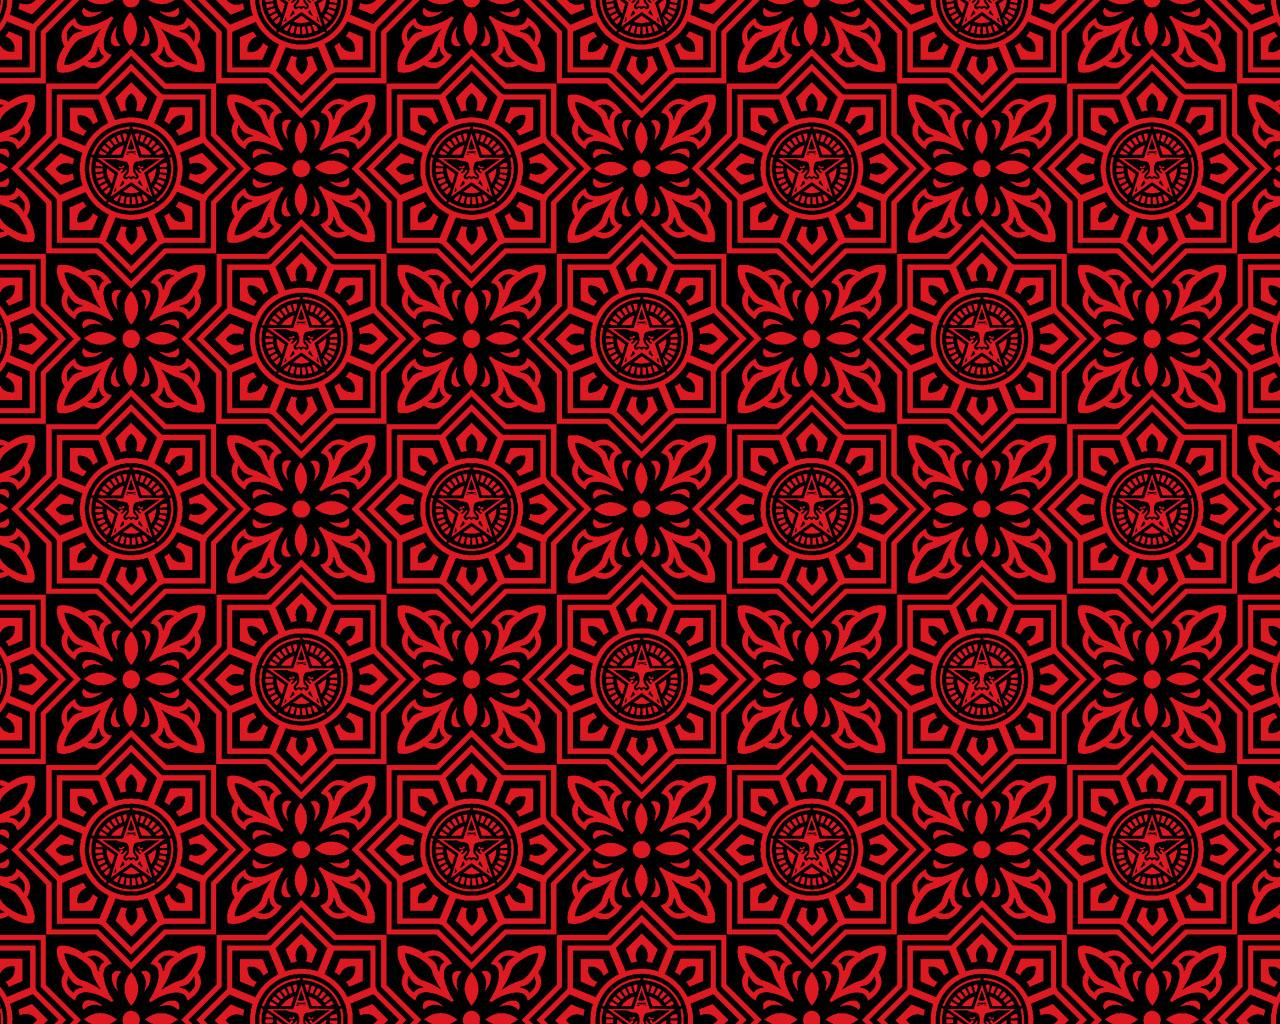 Obey Wallpaper httpwwwpic2flycomObeyWallpaperhtml 1280x1024